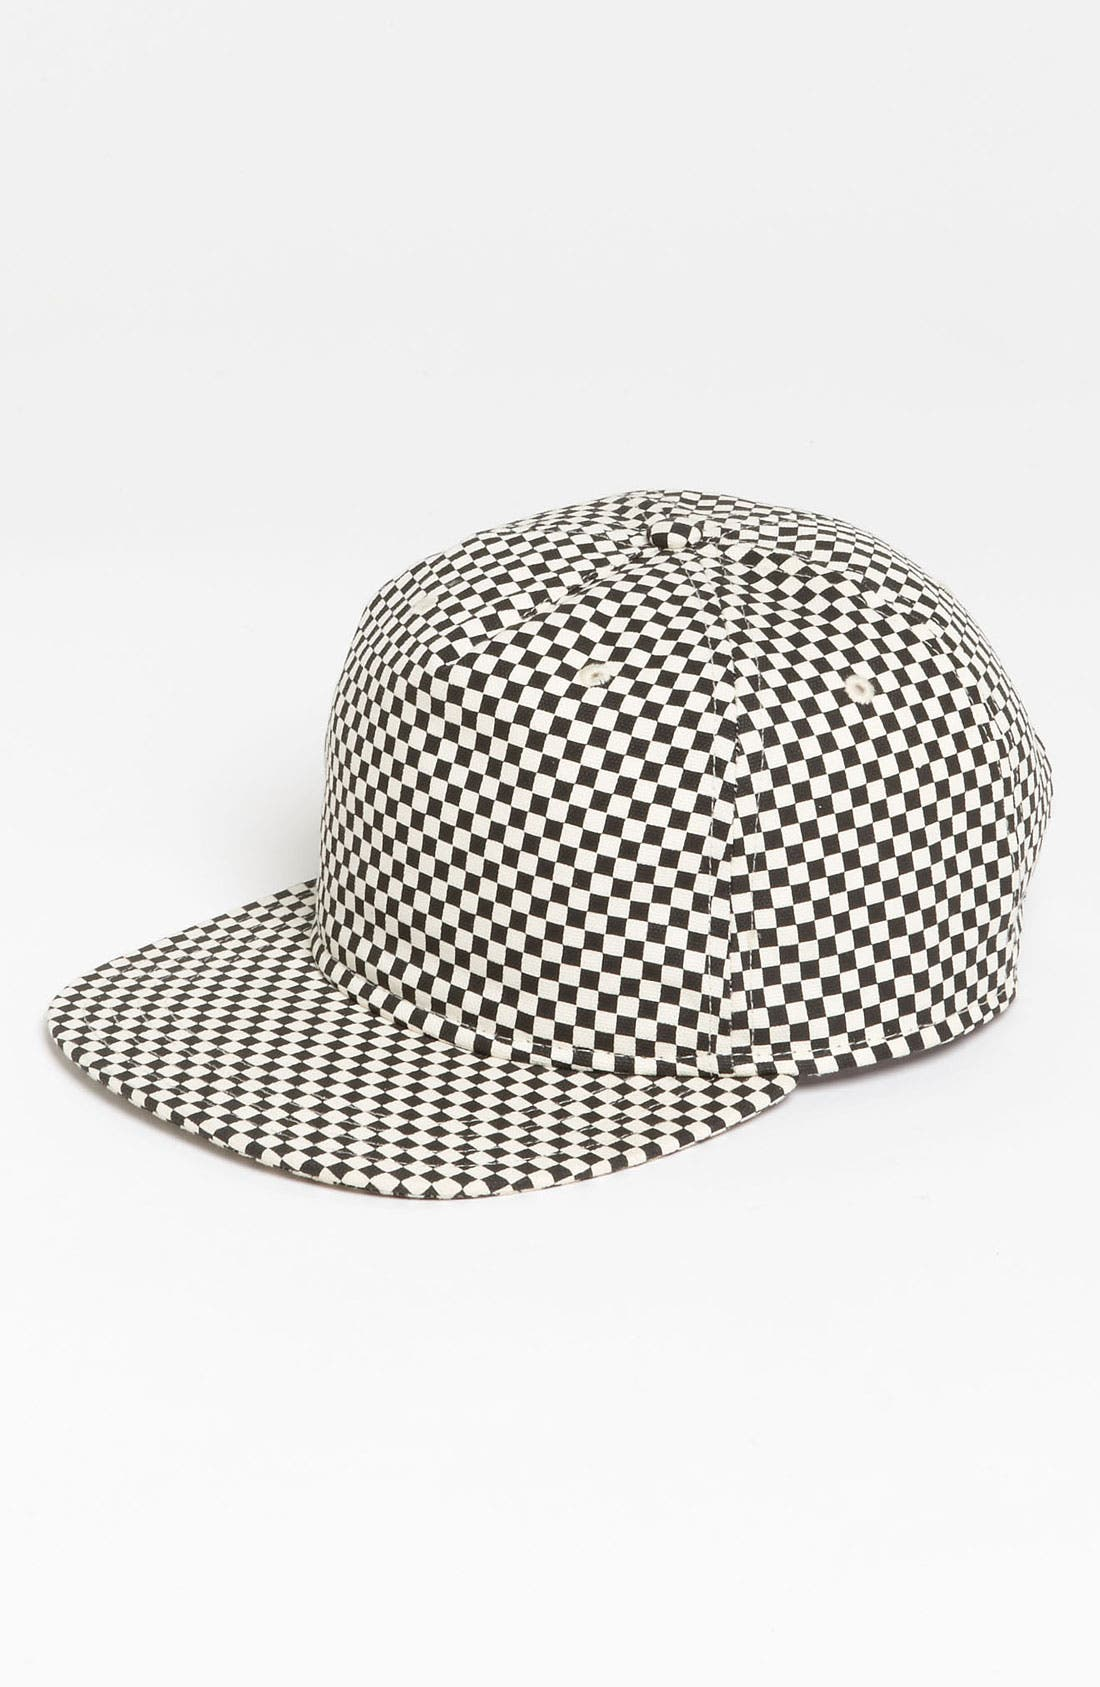 Main Image - Vans 'Checkerboard' Cap